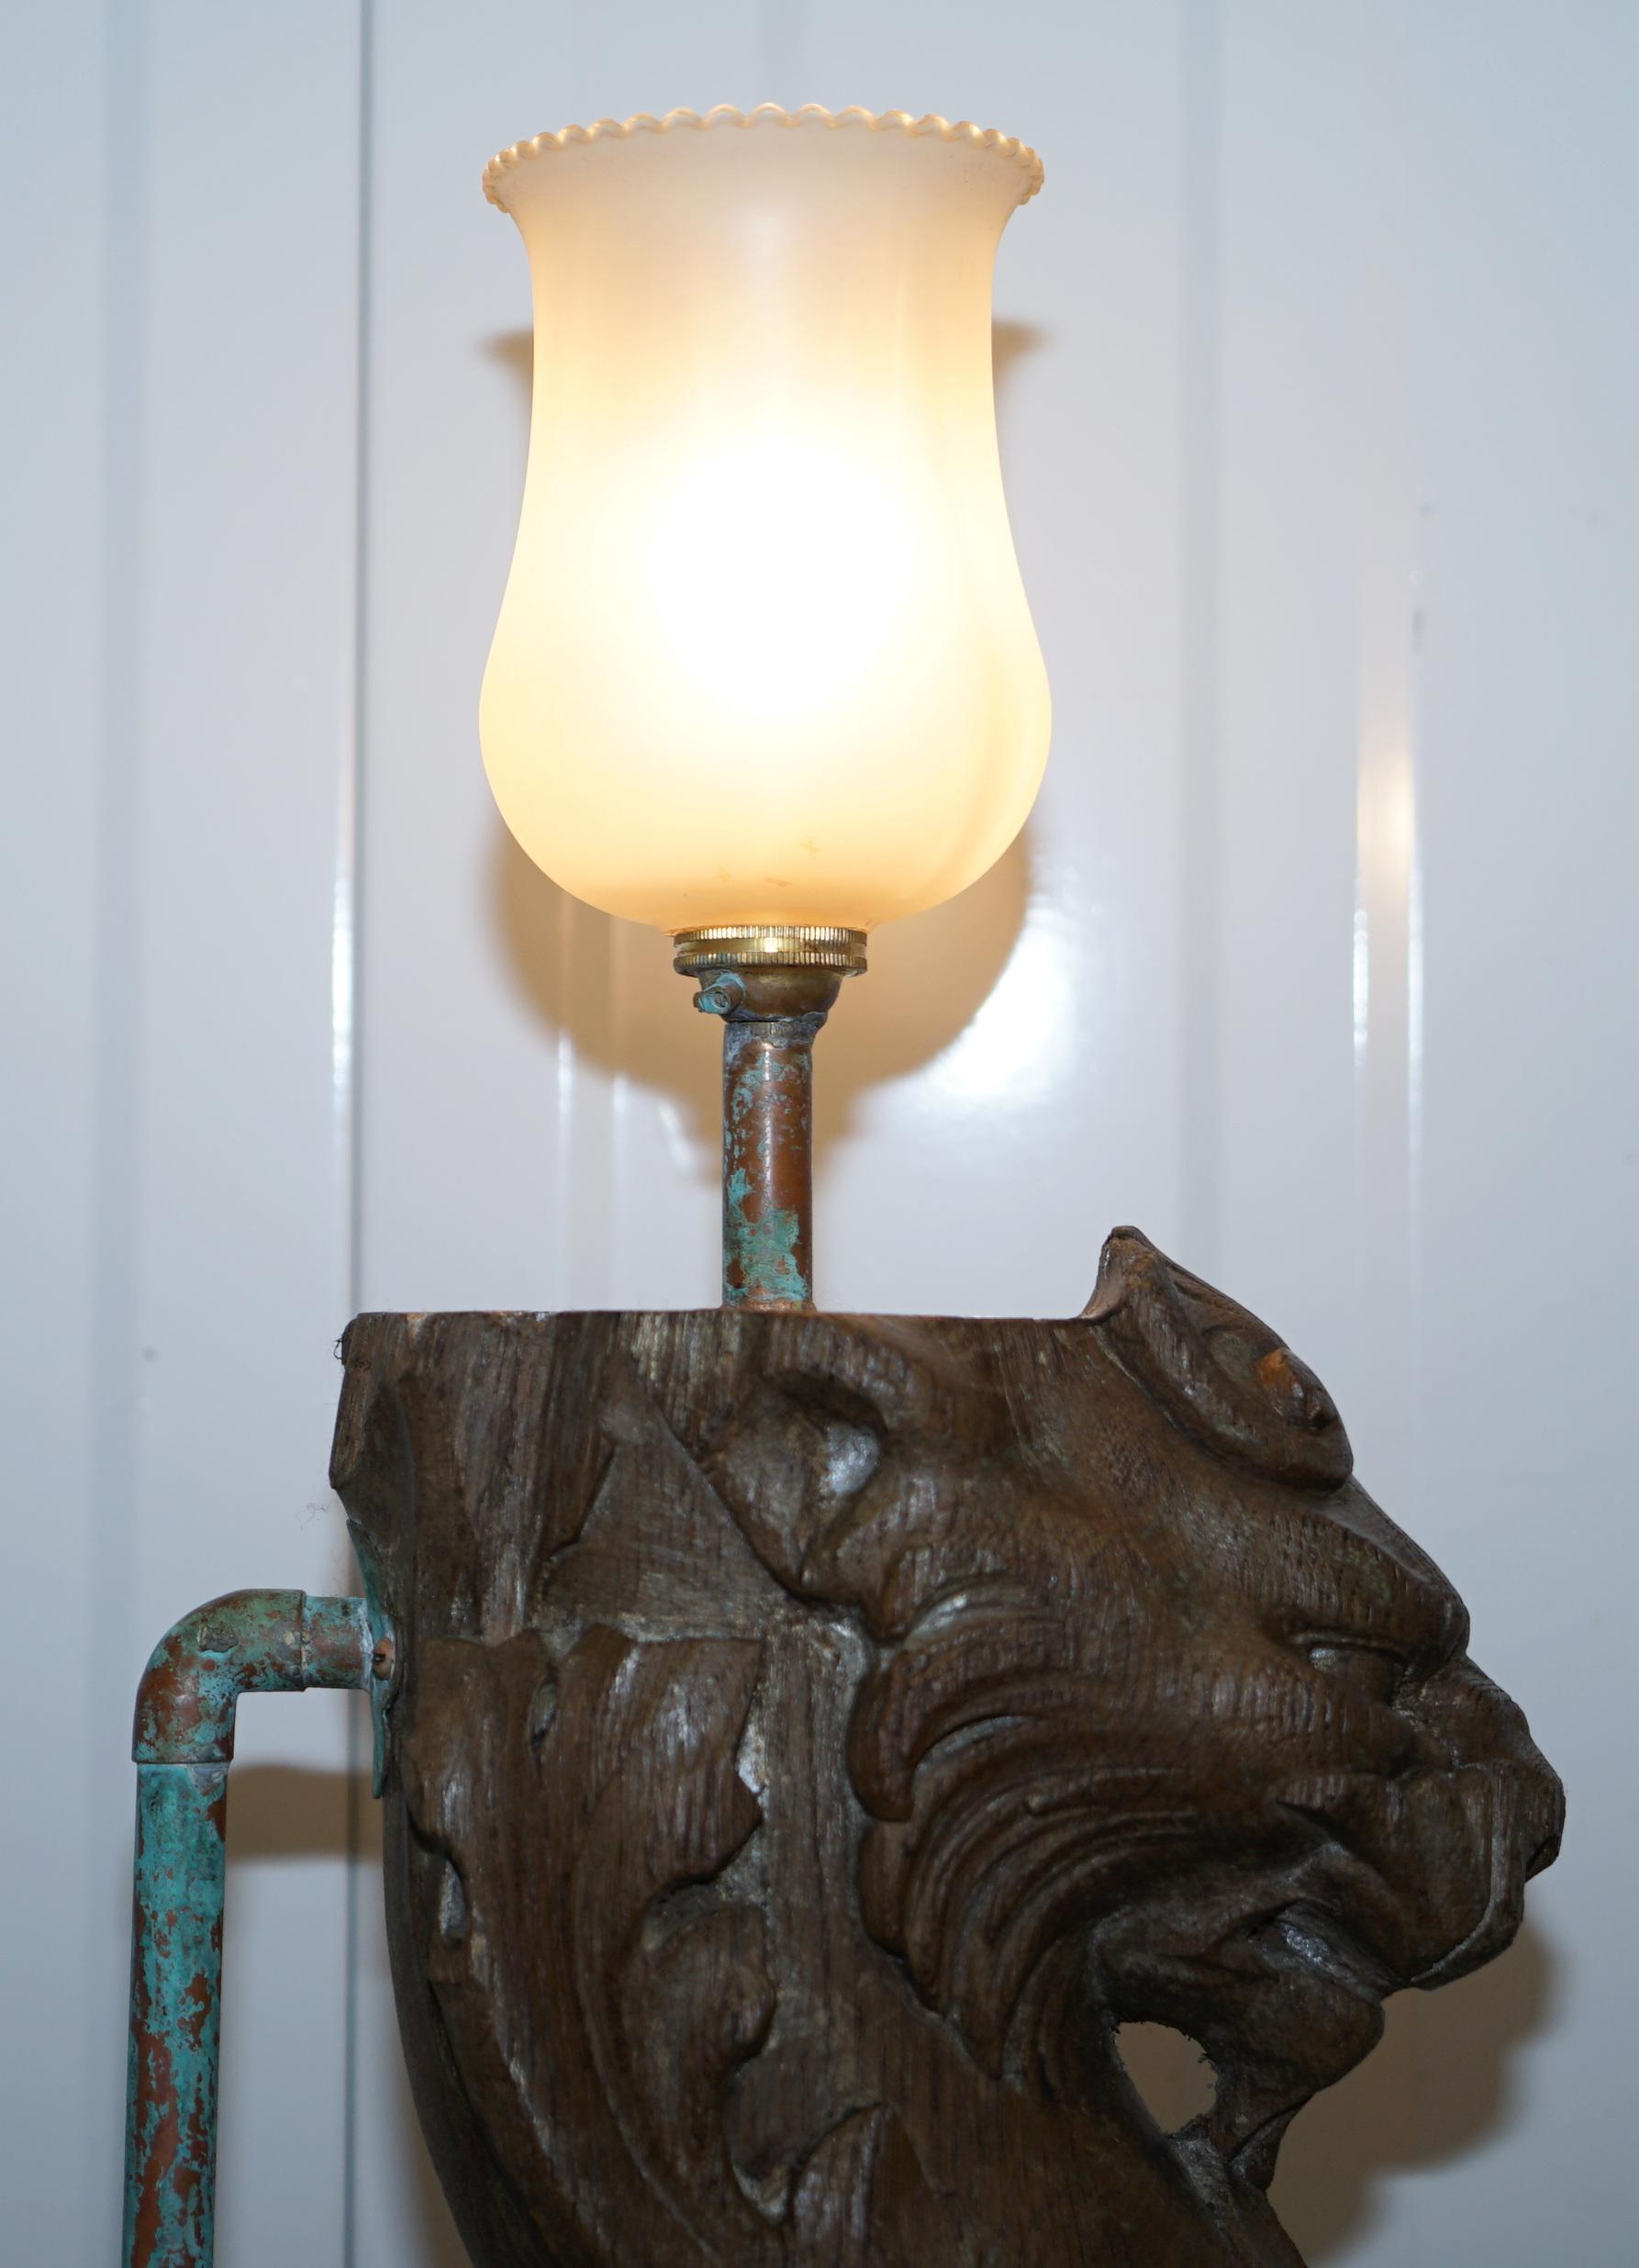 löwen lampe